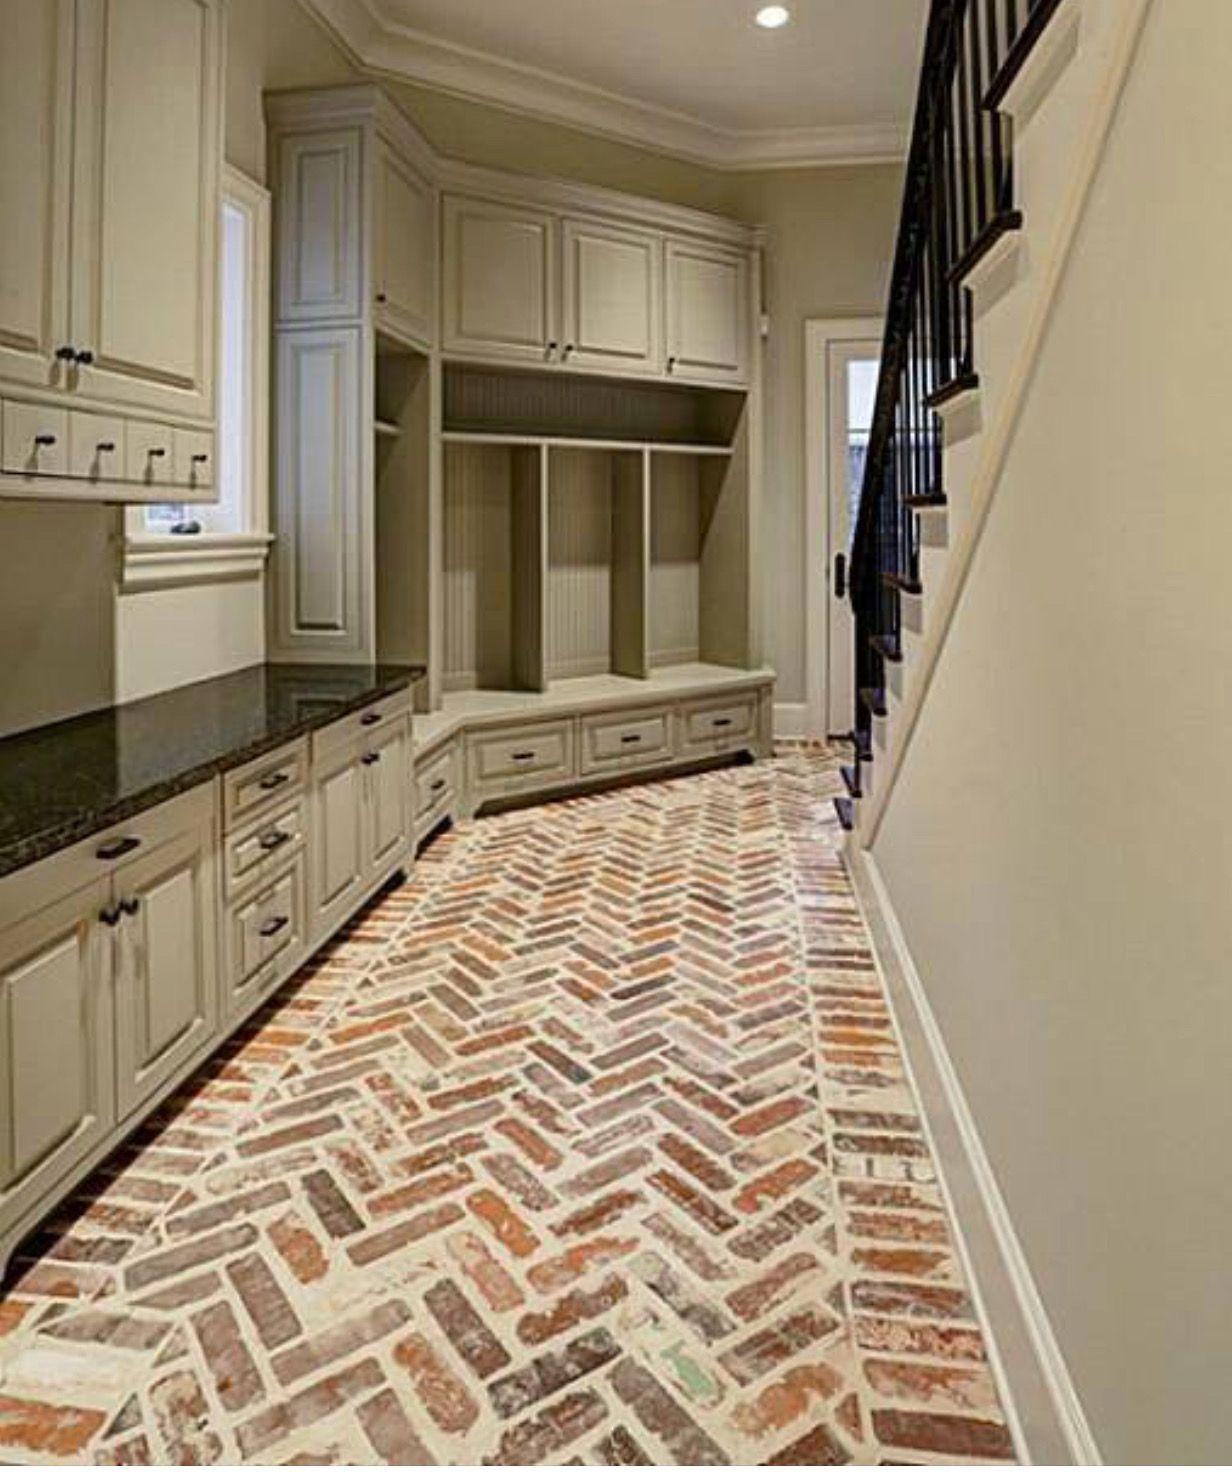 Brick Cobblestone Floor For Sunroom Achieve This Look With Glen